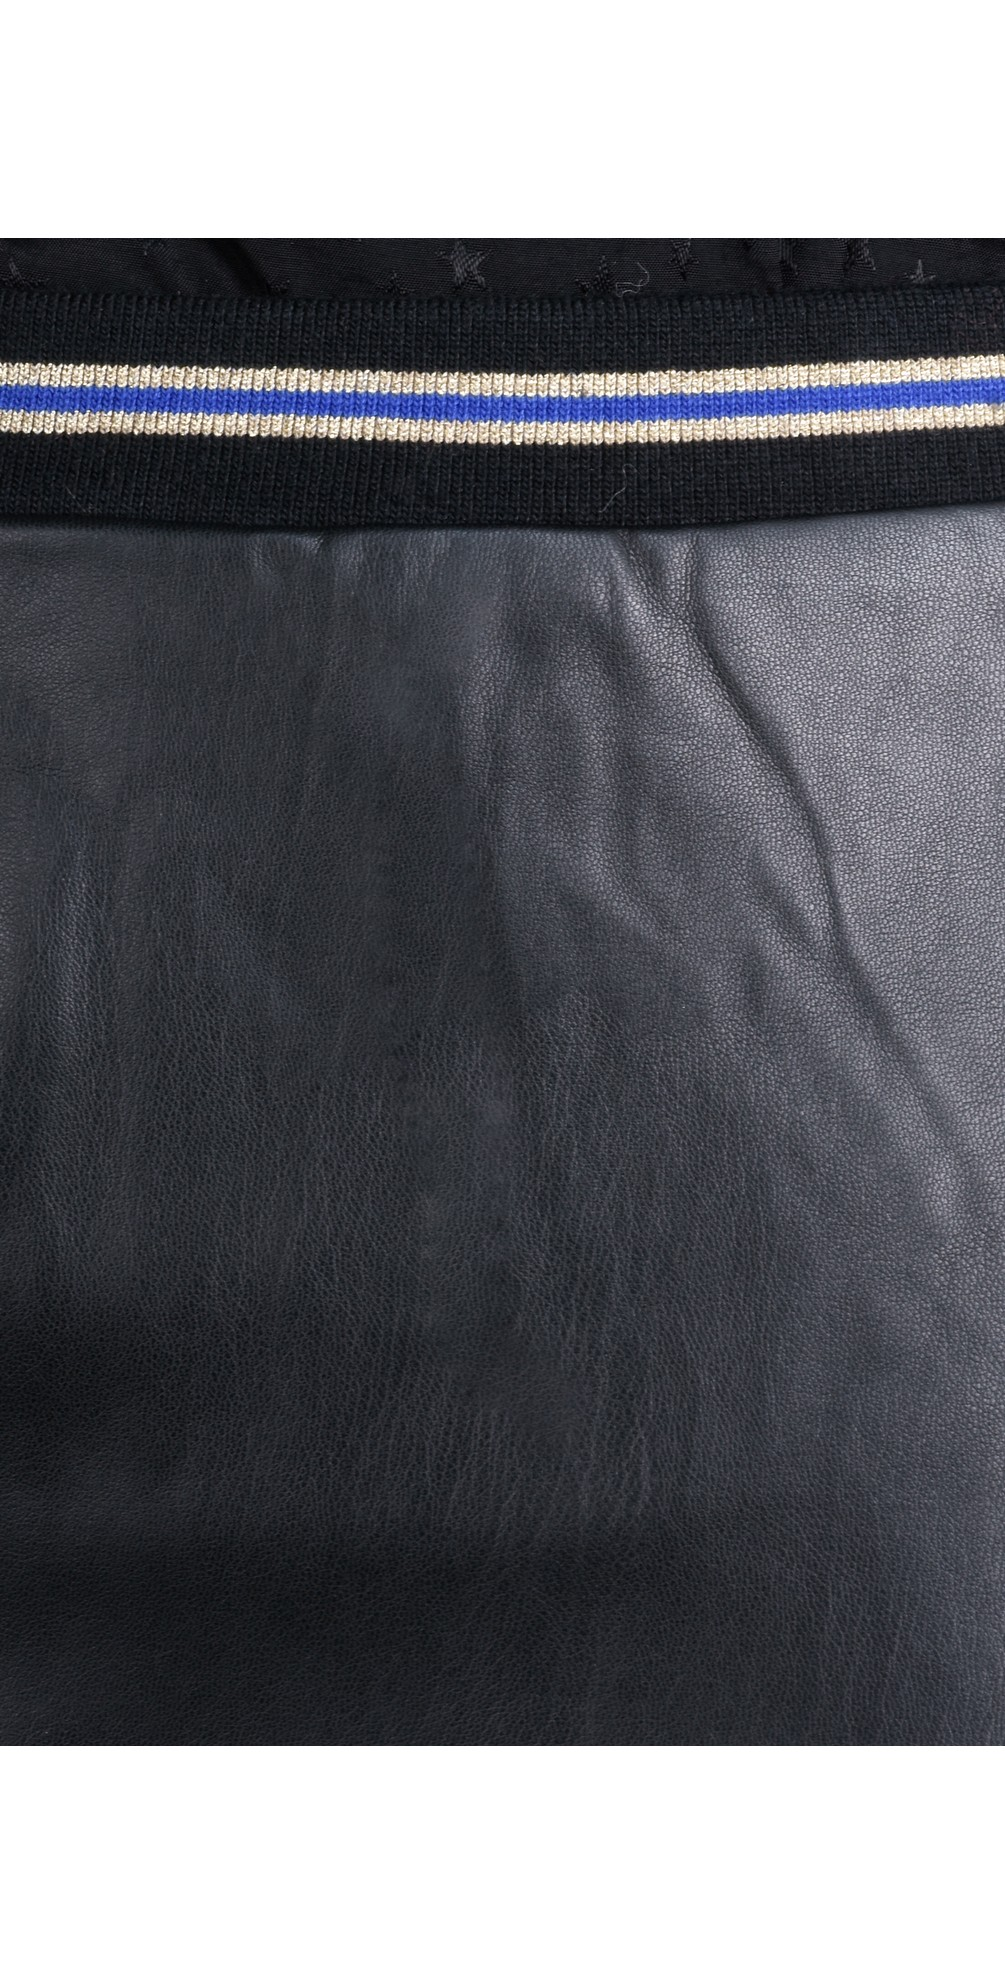 Koreen Faux Leather Skirt main image